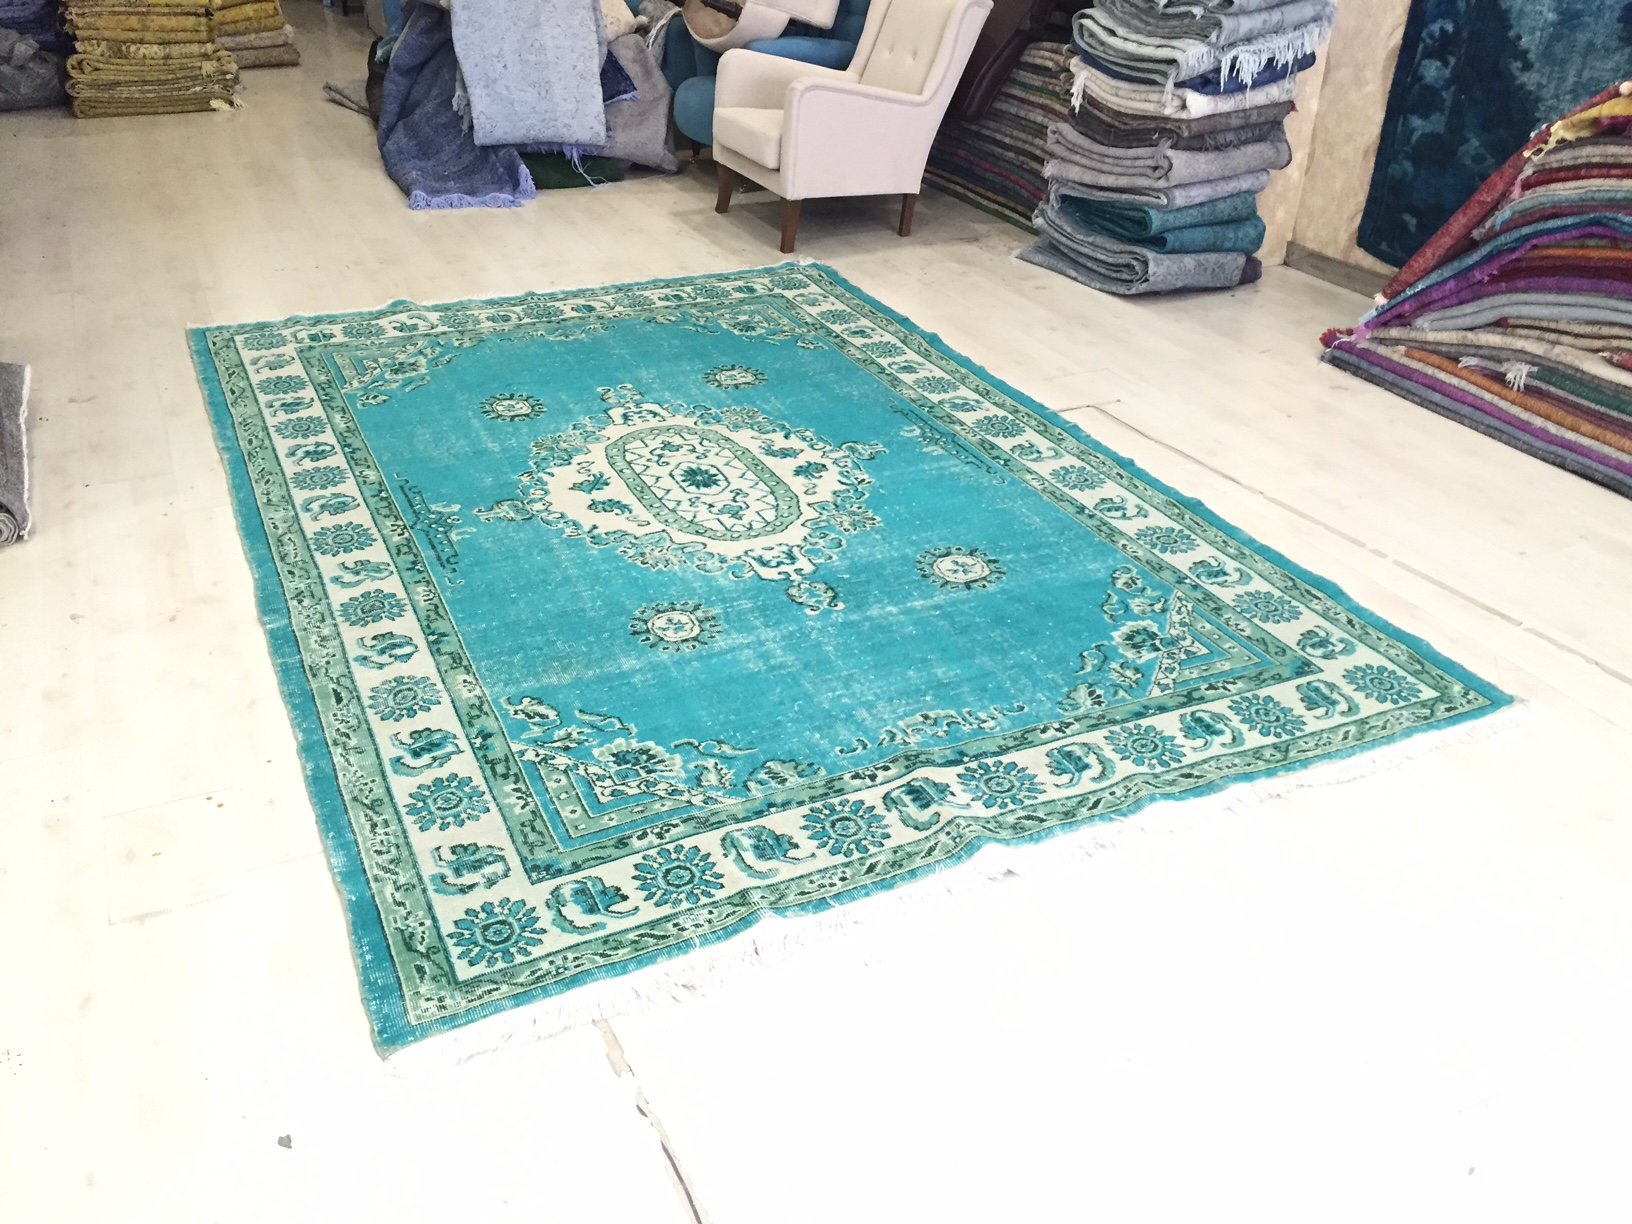 VERKOCHT groen blauw vintage vloerkleed 315cm x 214cm  (nr4852)